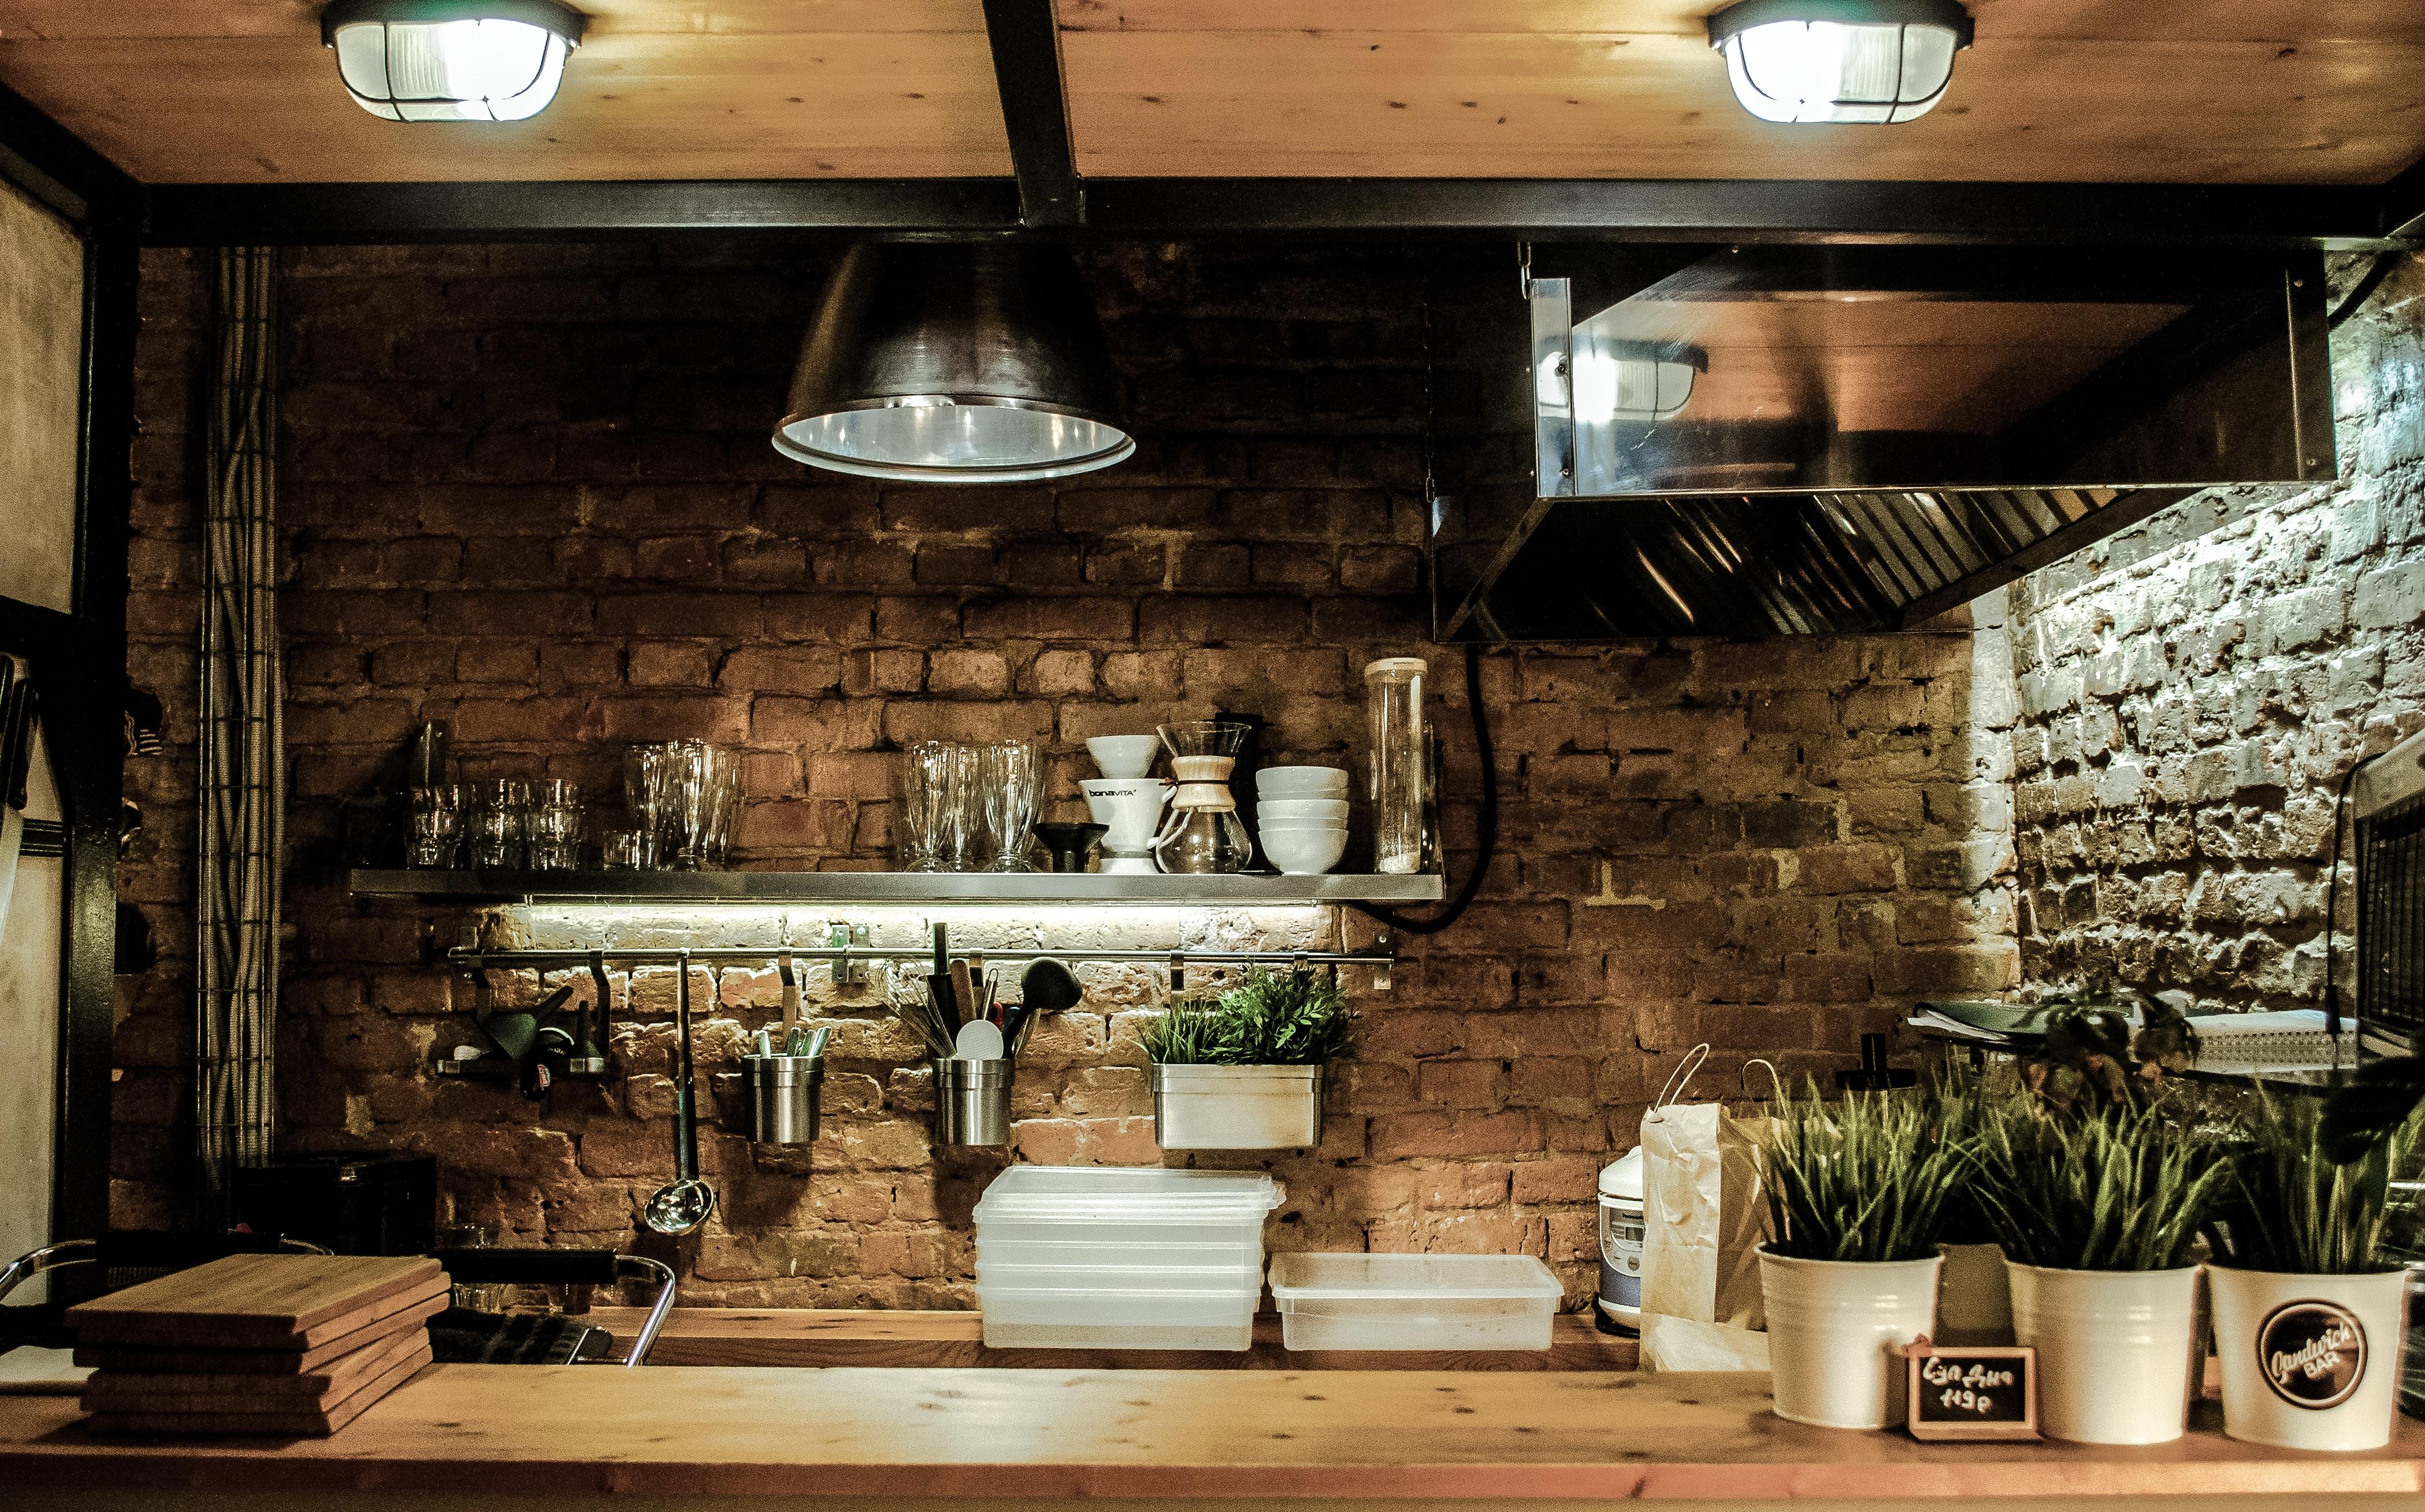 lamp on the kitchen